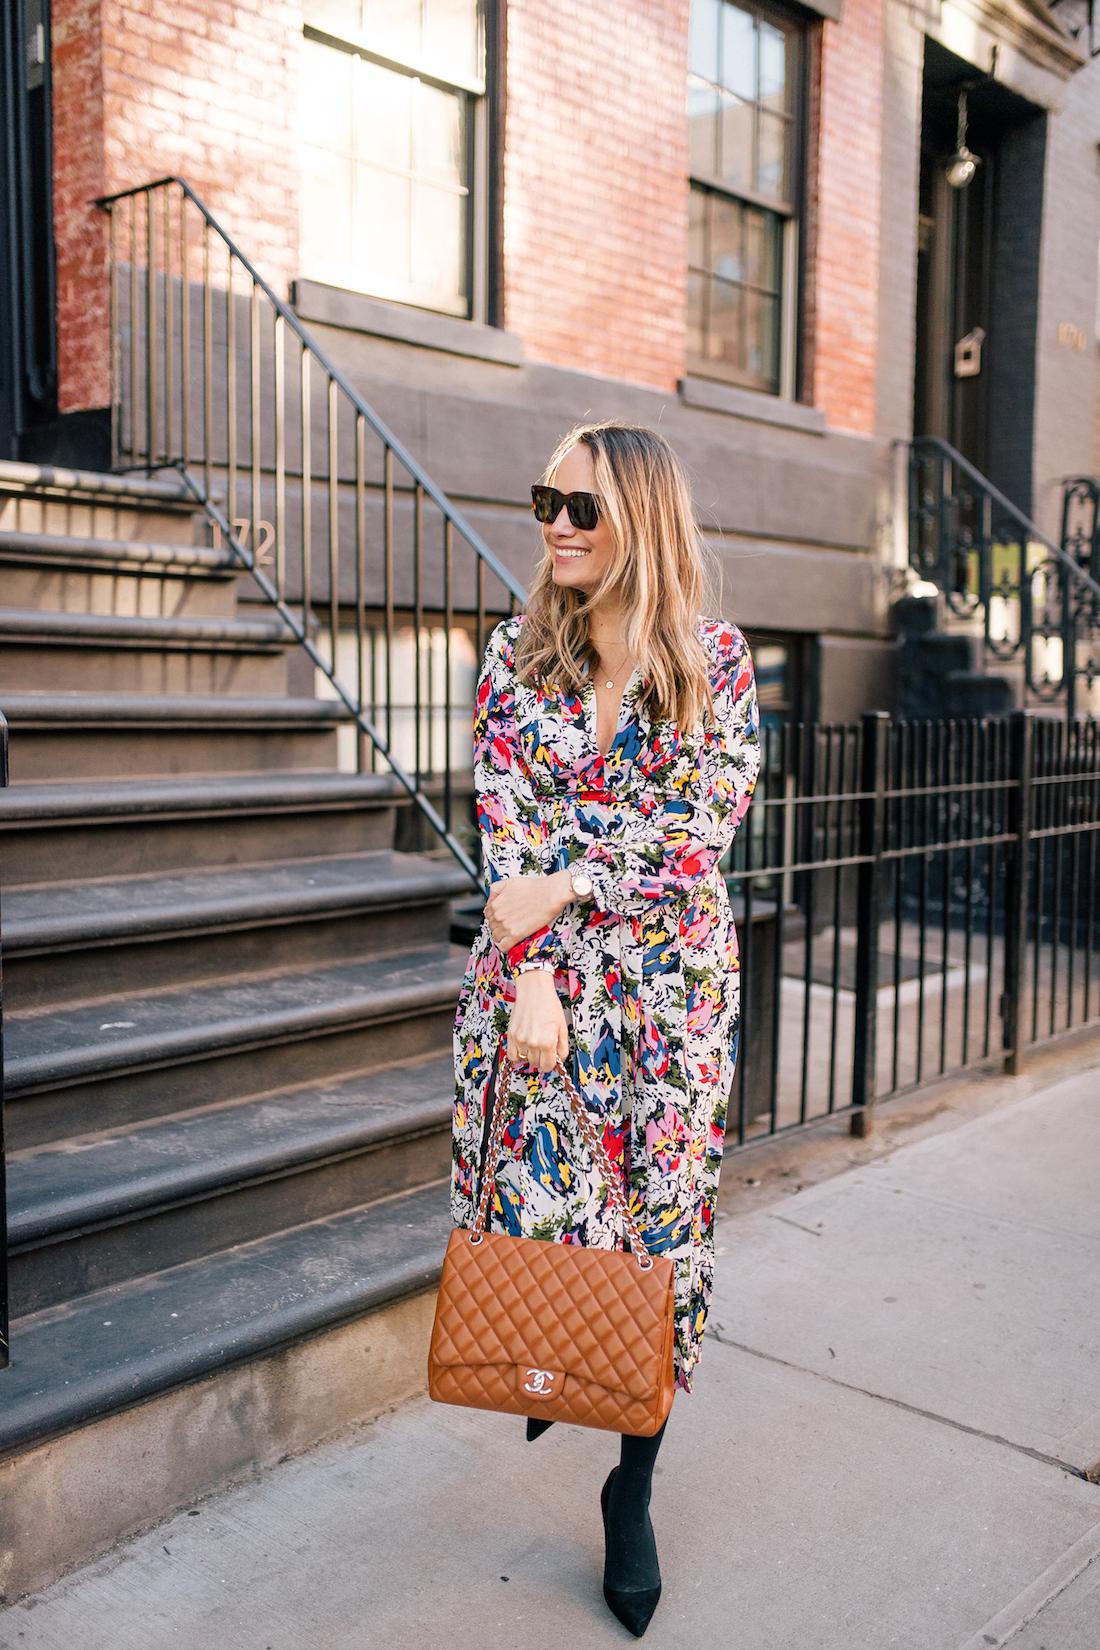 The Stripe's Outfit Details: Rixo Floral Dress // Express Tights // Manolo Blahnik Heels // Chanel Purse // Celine Sunglasses // Tuckernuck Birdcage Earrings